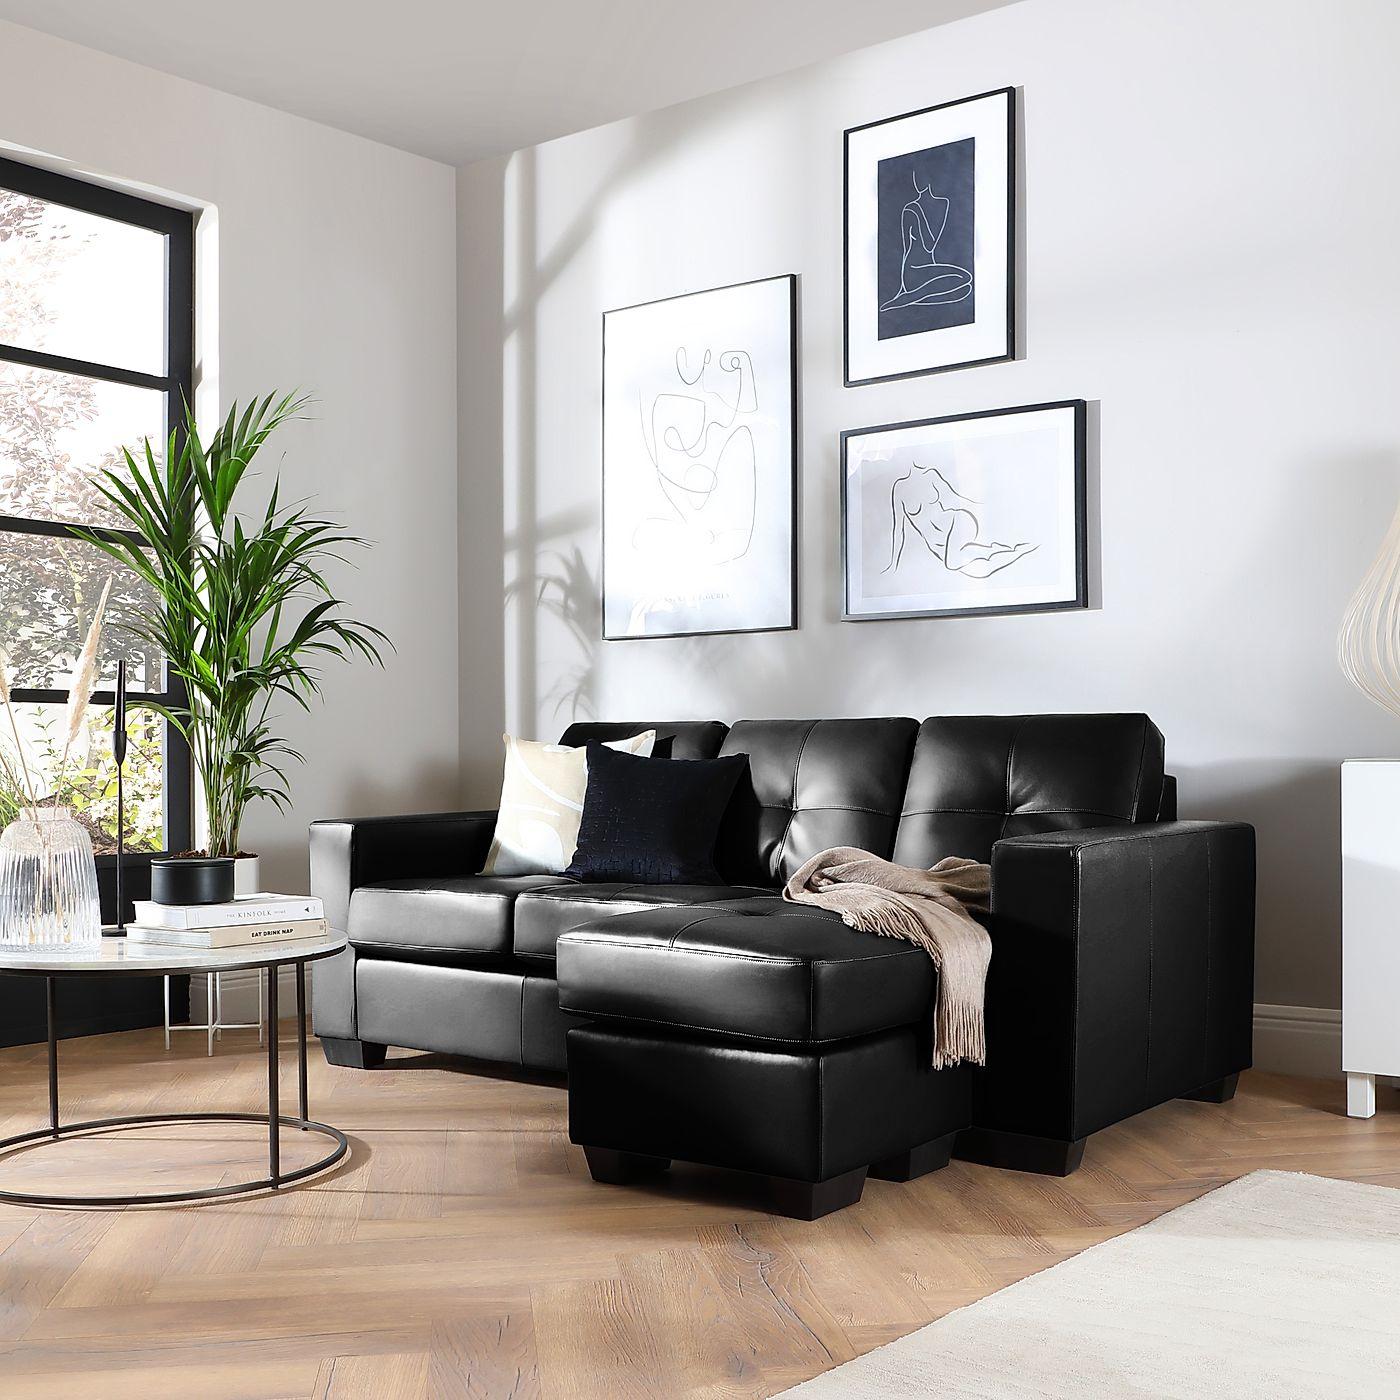 Rio Black Leather L Shape Corner Sofa   Furniture Choice In Leather Corner Sofas (View 2 of 15)